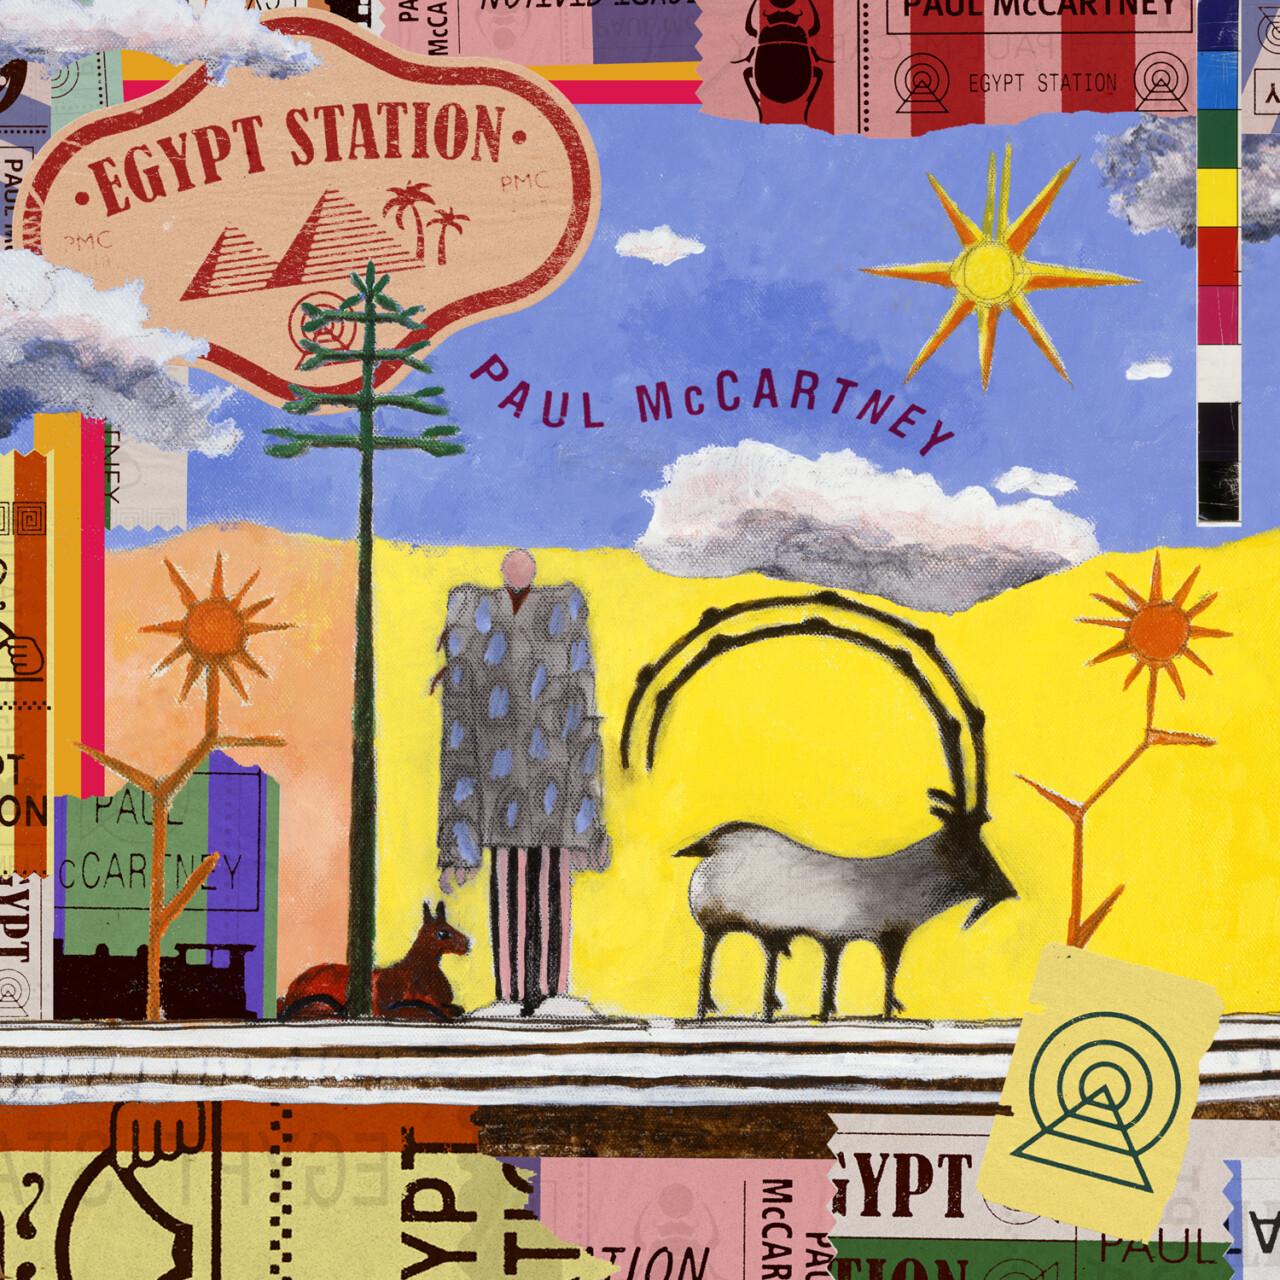 Ferry Gouw Paul McCartney Egypt Station